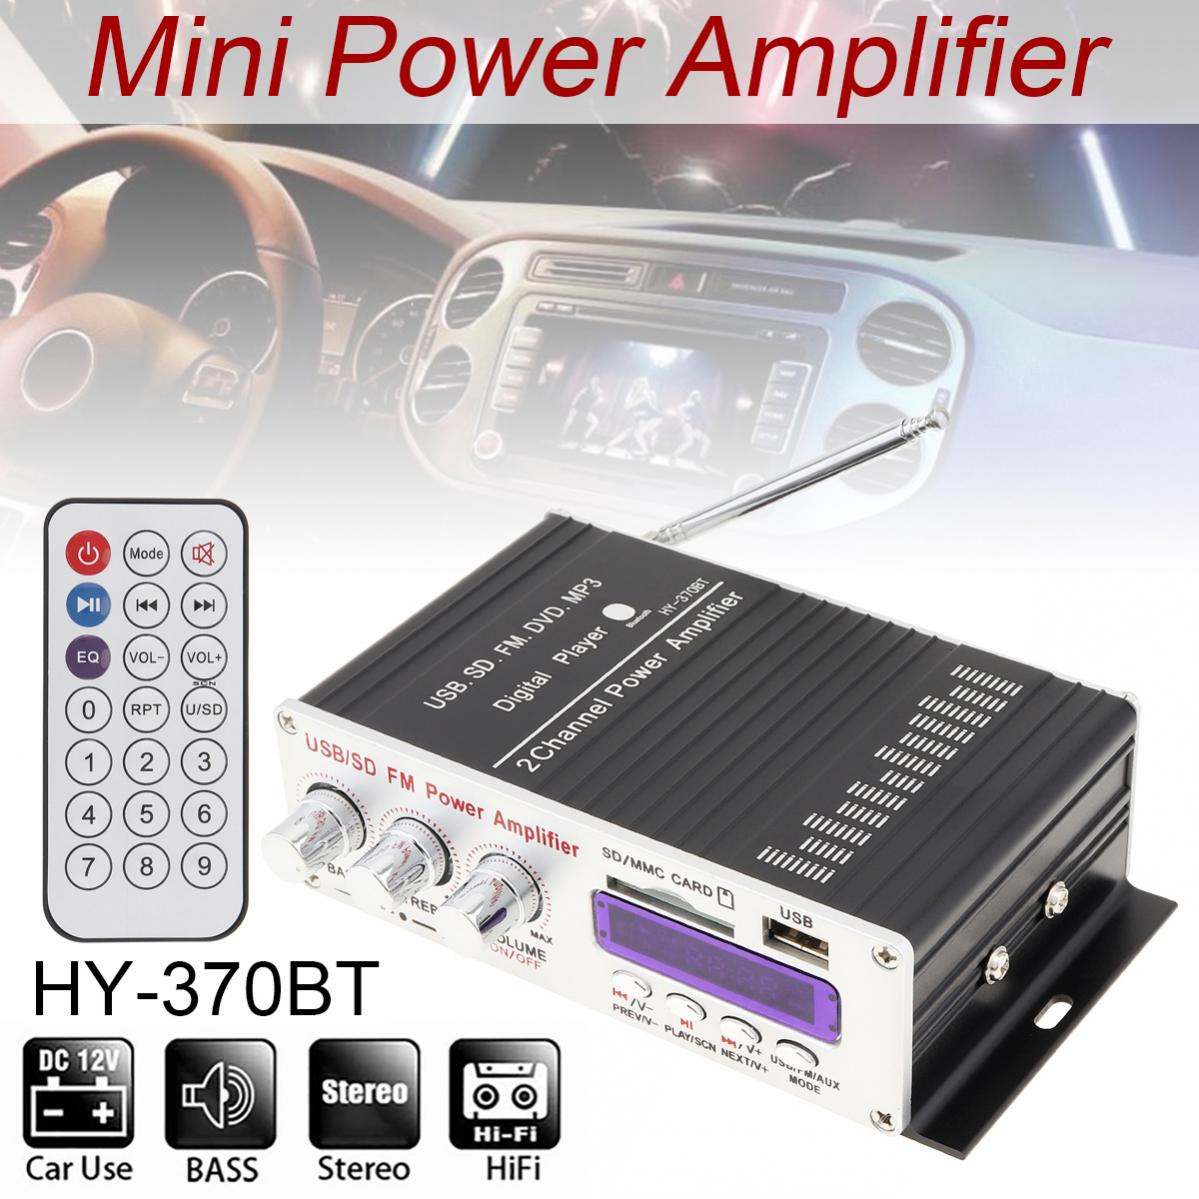 Remote Control Bluetooth 2CH HI-FI Car Audio High Power Amplifier FM Radio Player Support SD /USB/ MP3 for Car Motorcycle